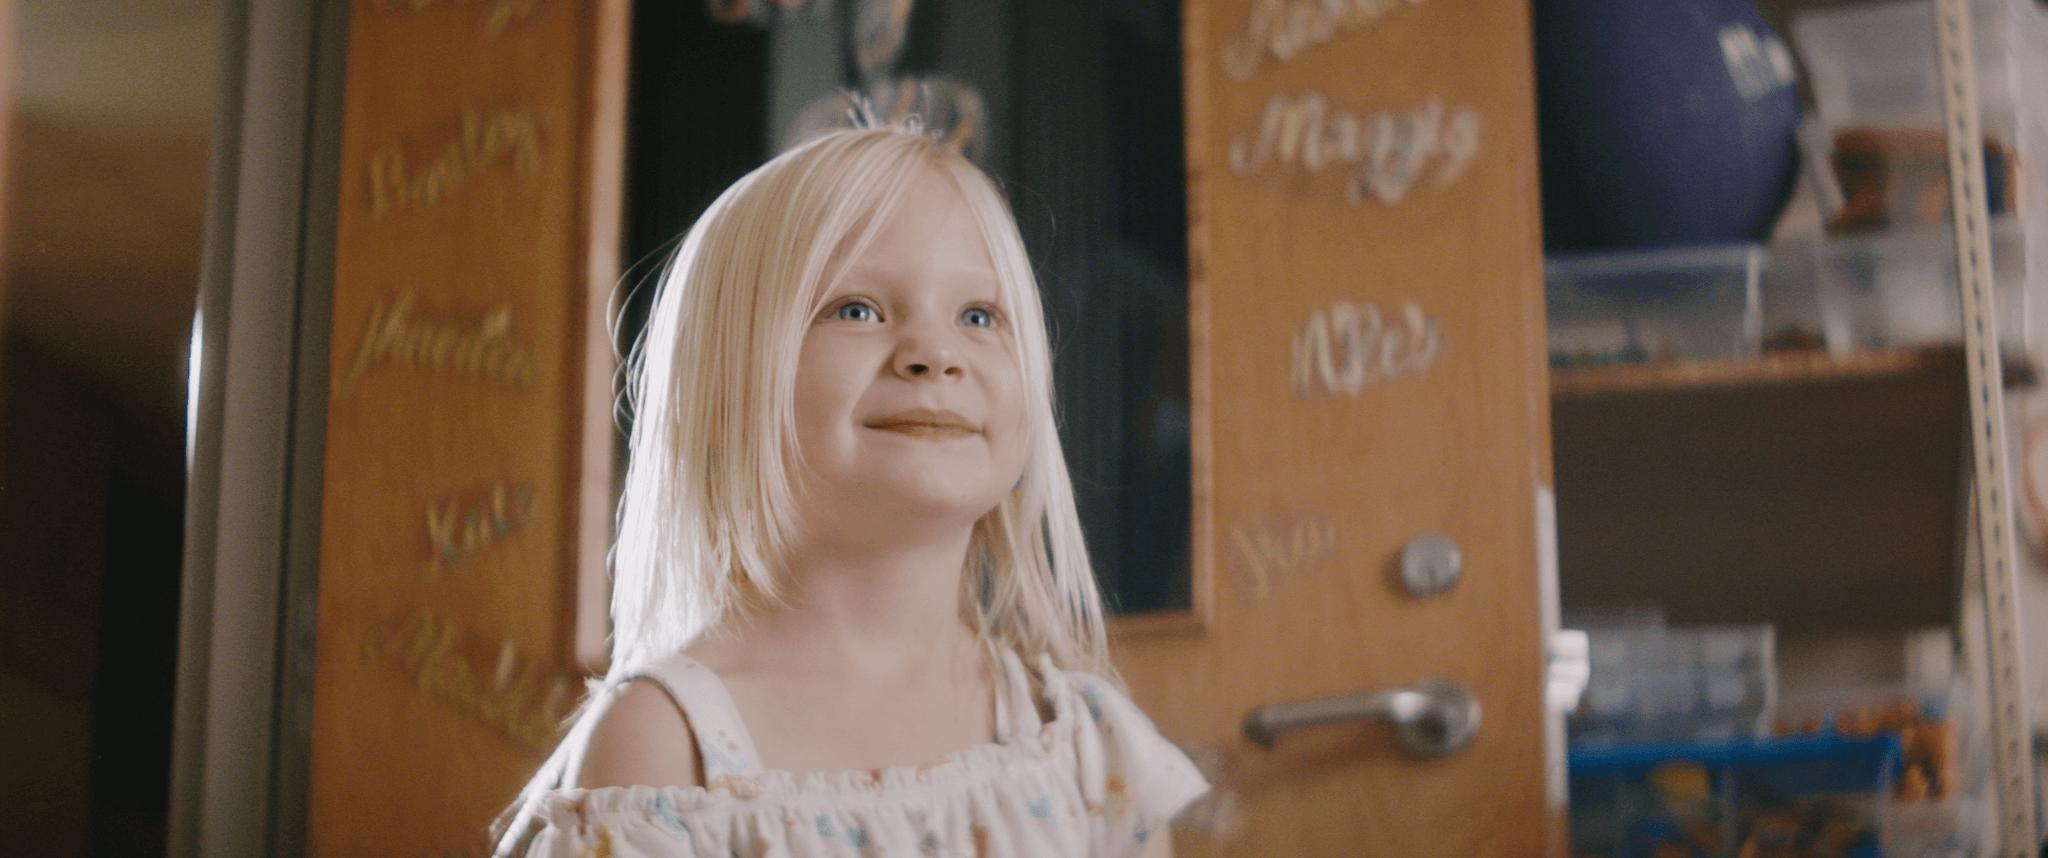 HPCDSB – Early Literacy